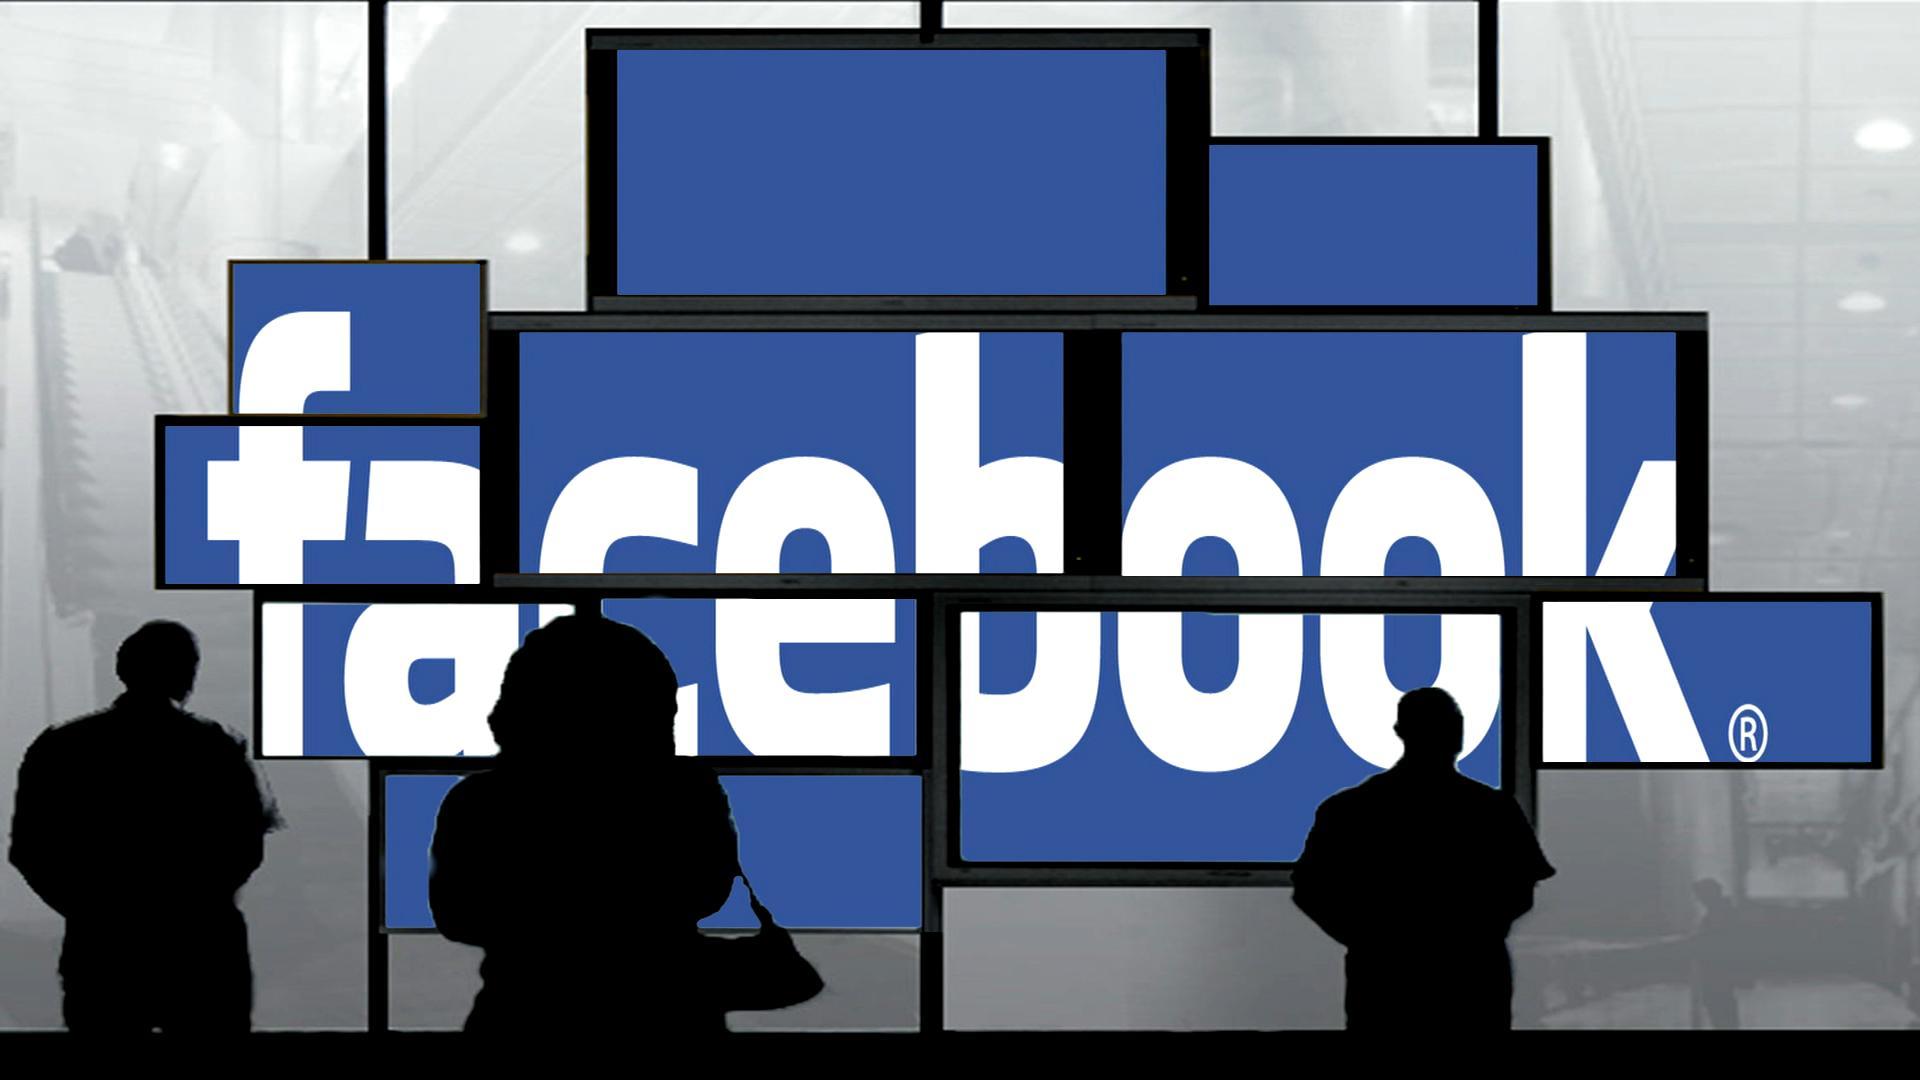 Иллюстрация на тему Размер фото для Фейсбука: профиля, поста или аватарки